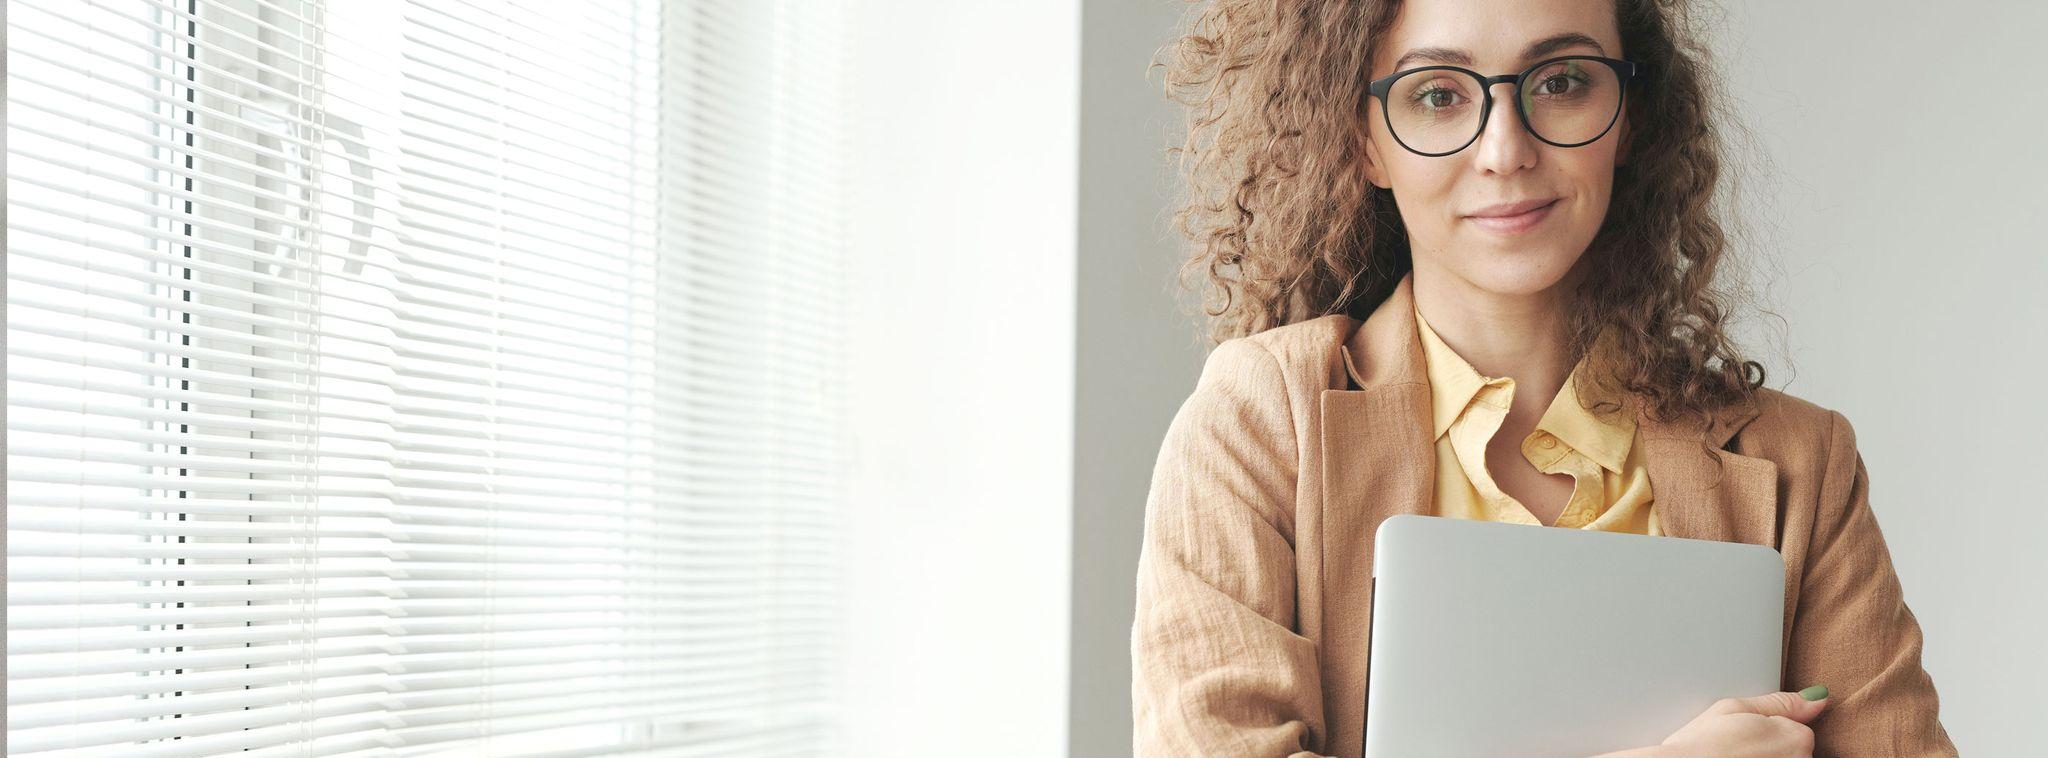 Datenschutz personenbezogener Daten